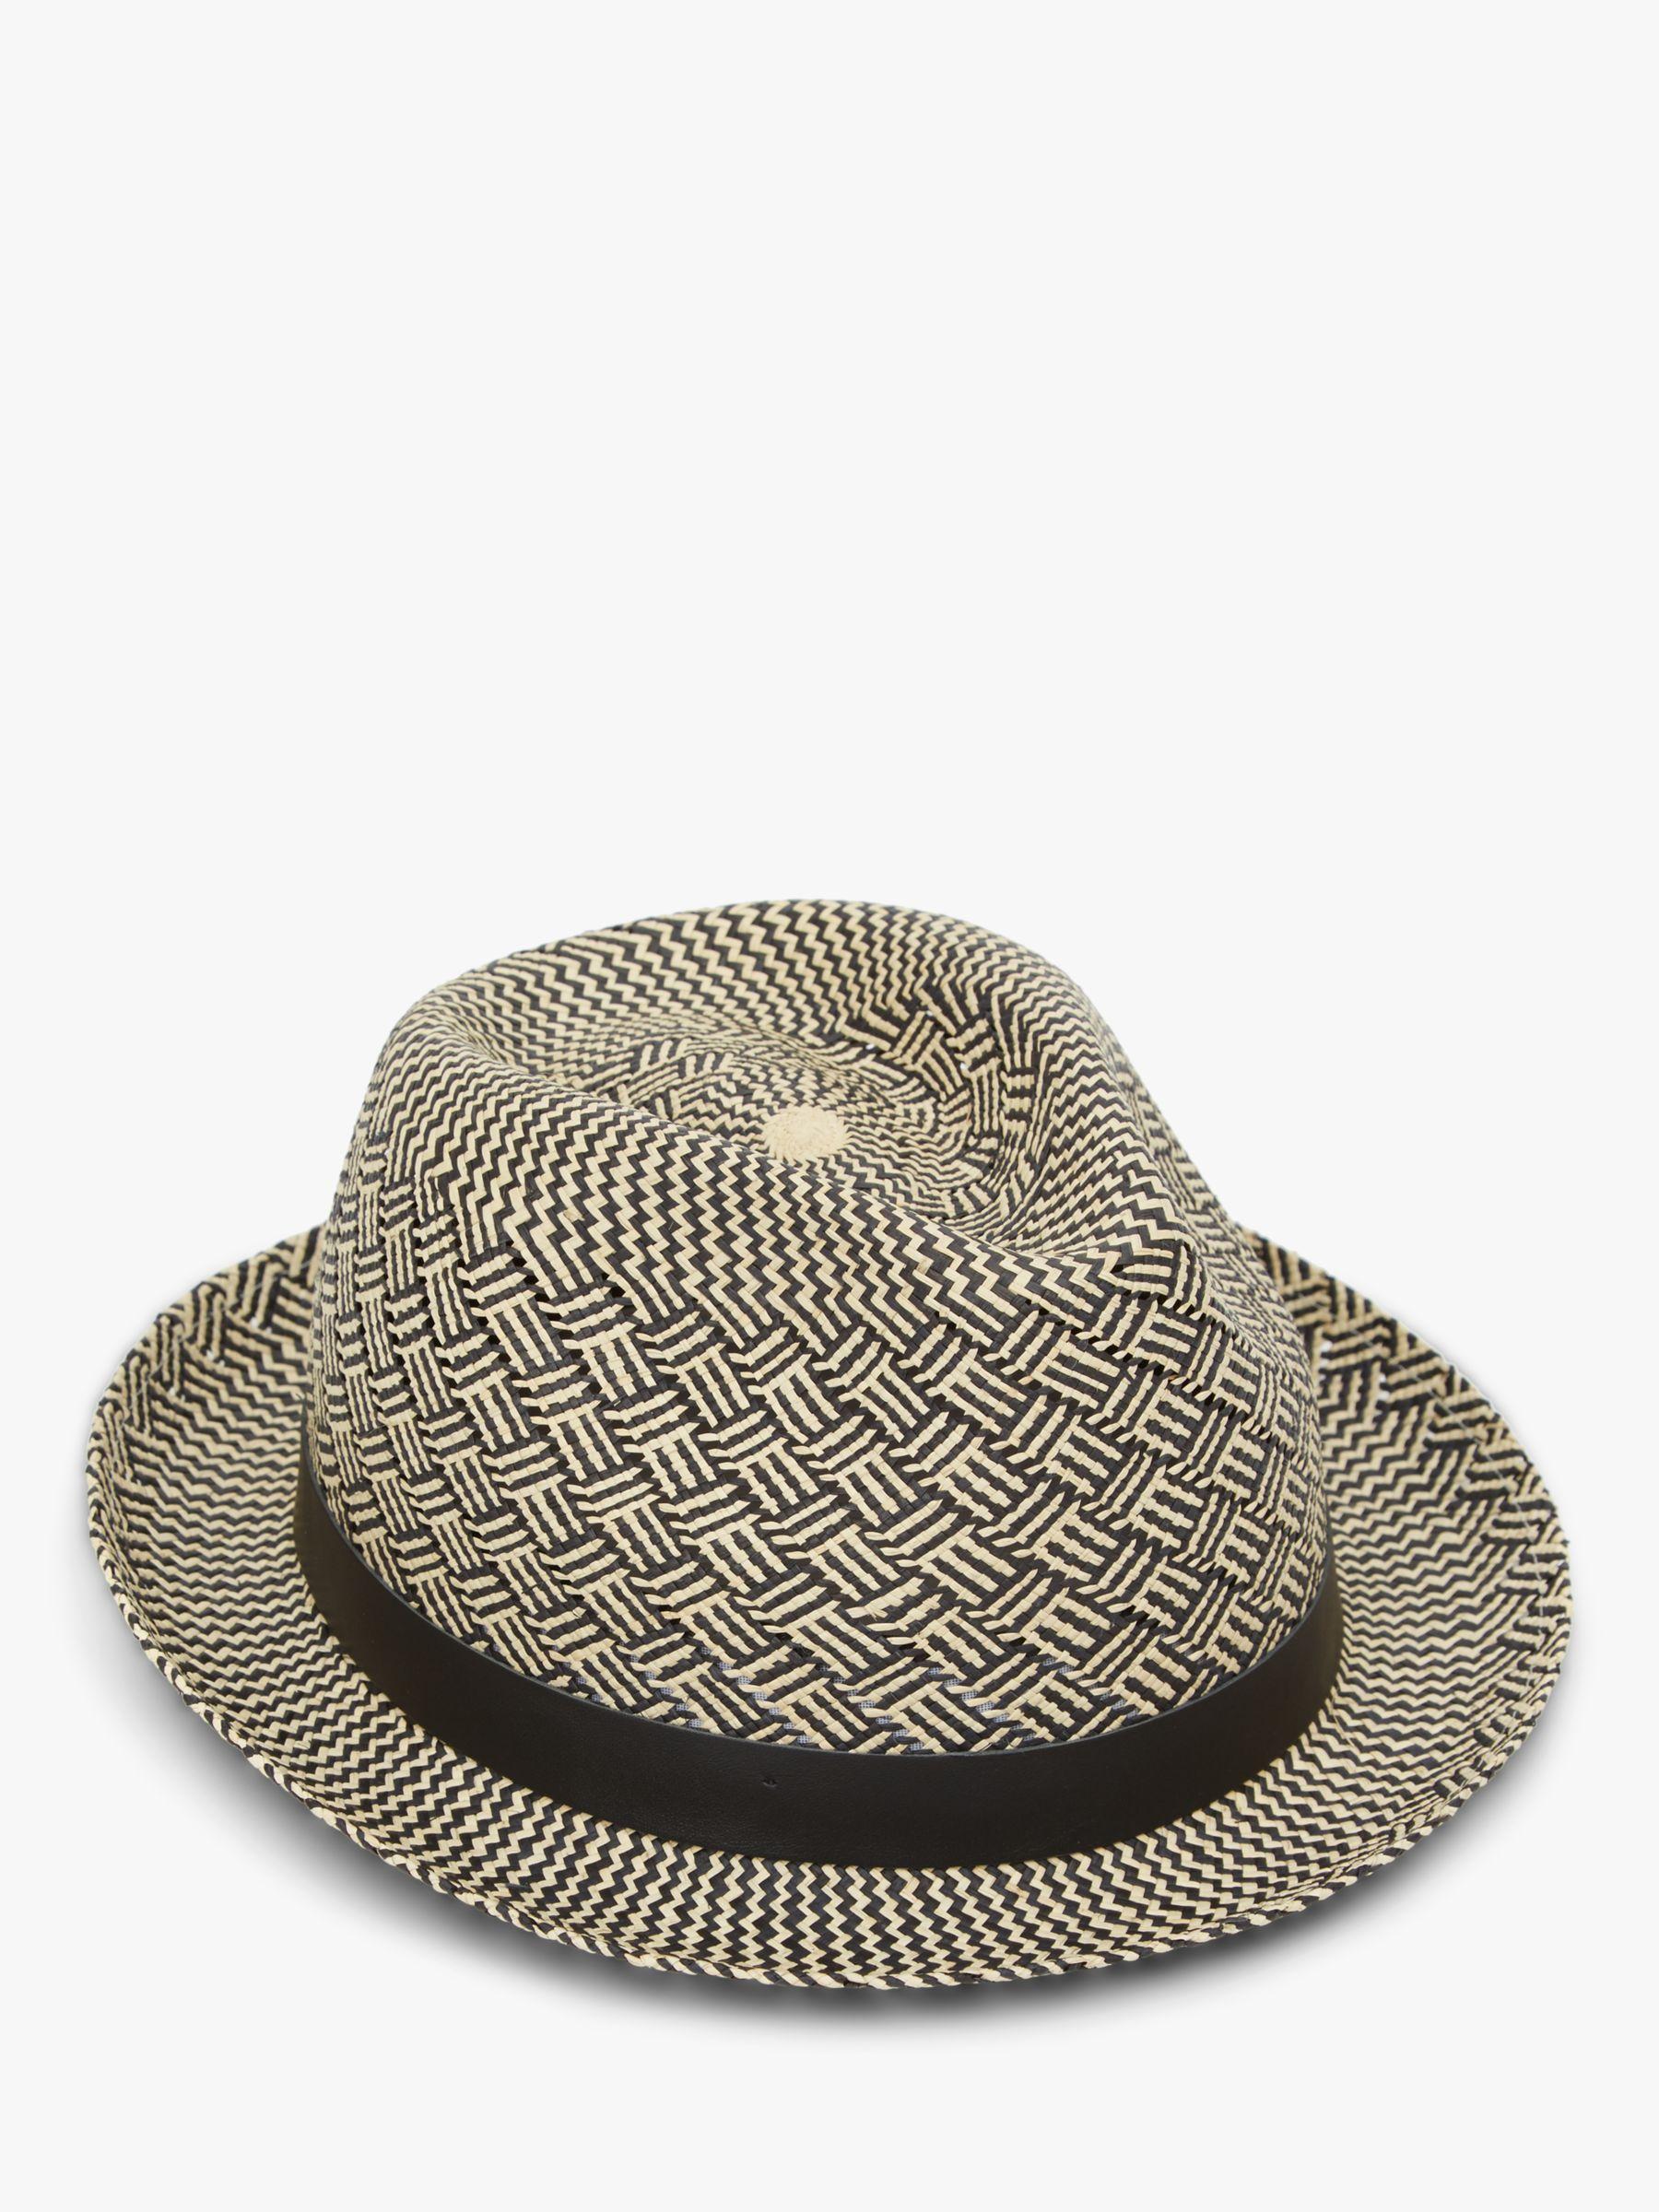 19261ae64 Christys' Black Charlie Parquet Panama Hat for men